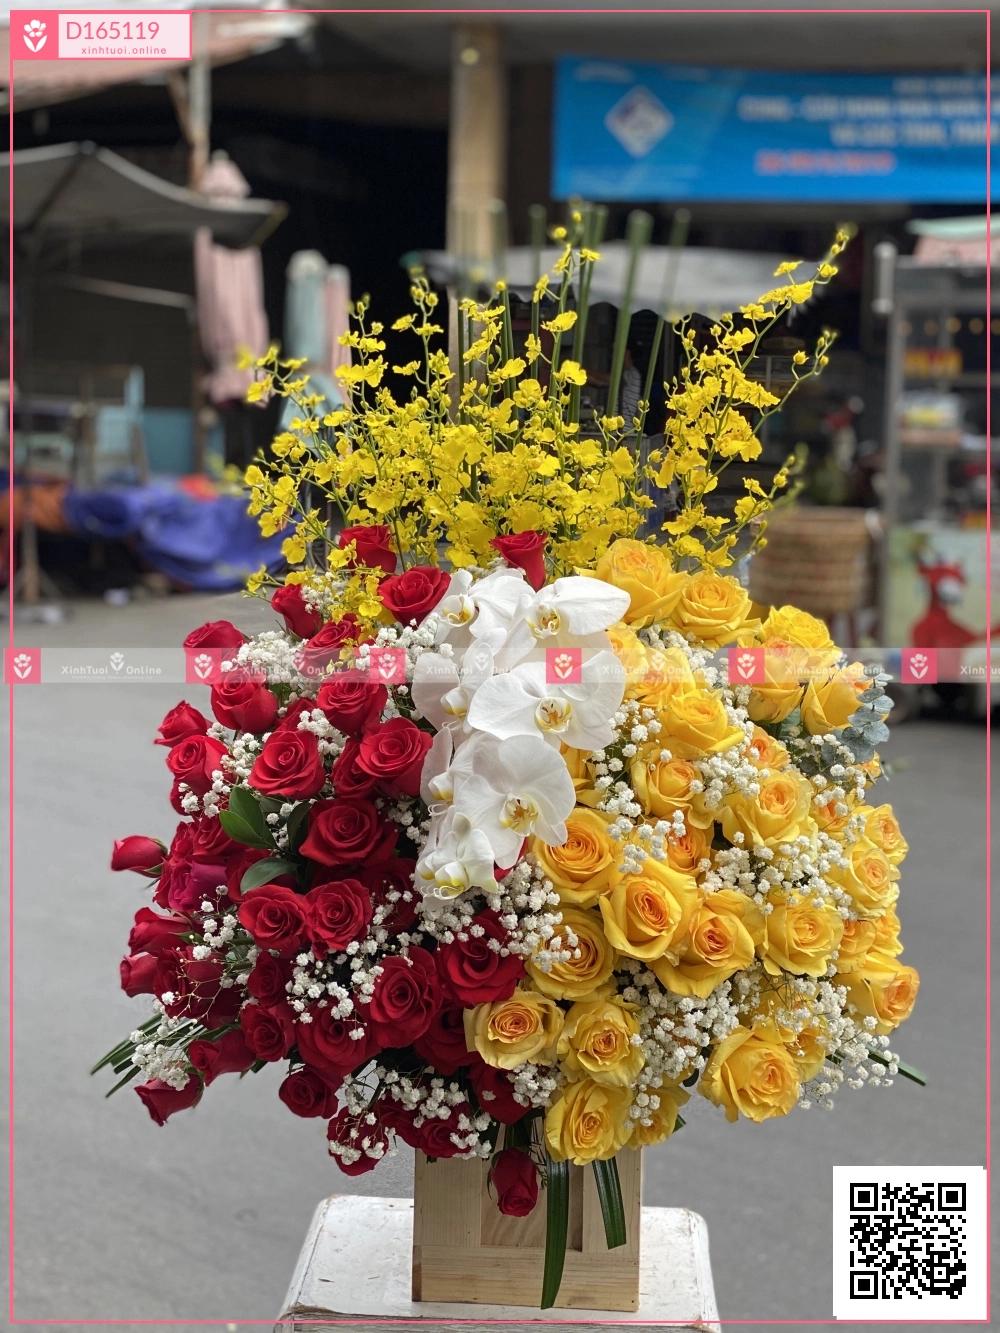 Mùa yêu - D165119 - xinhtuoi.online